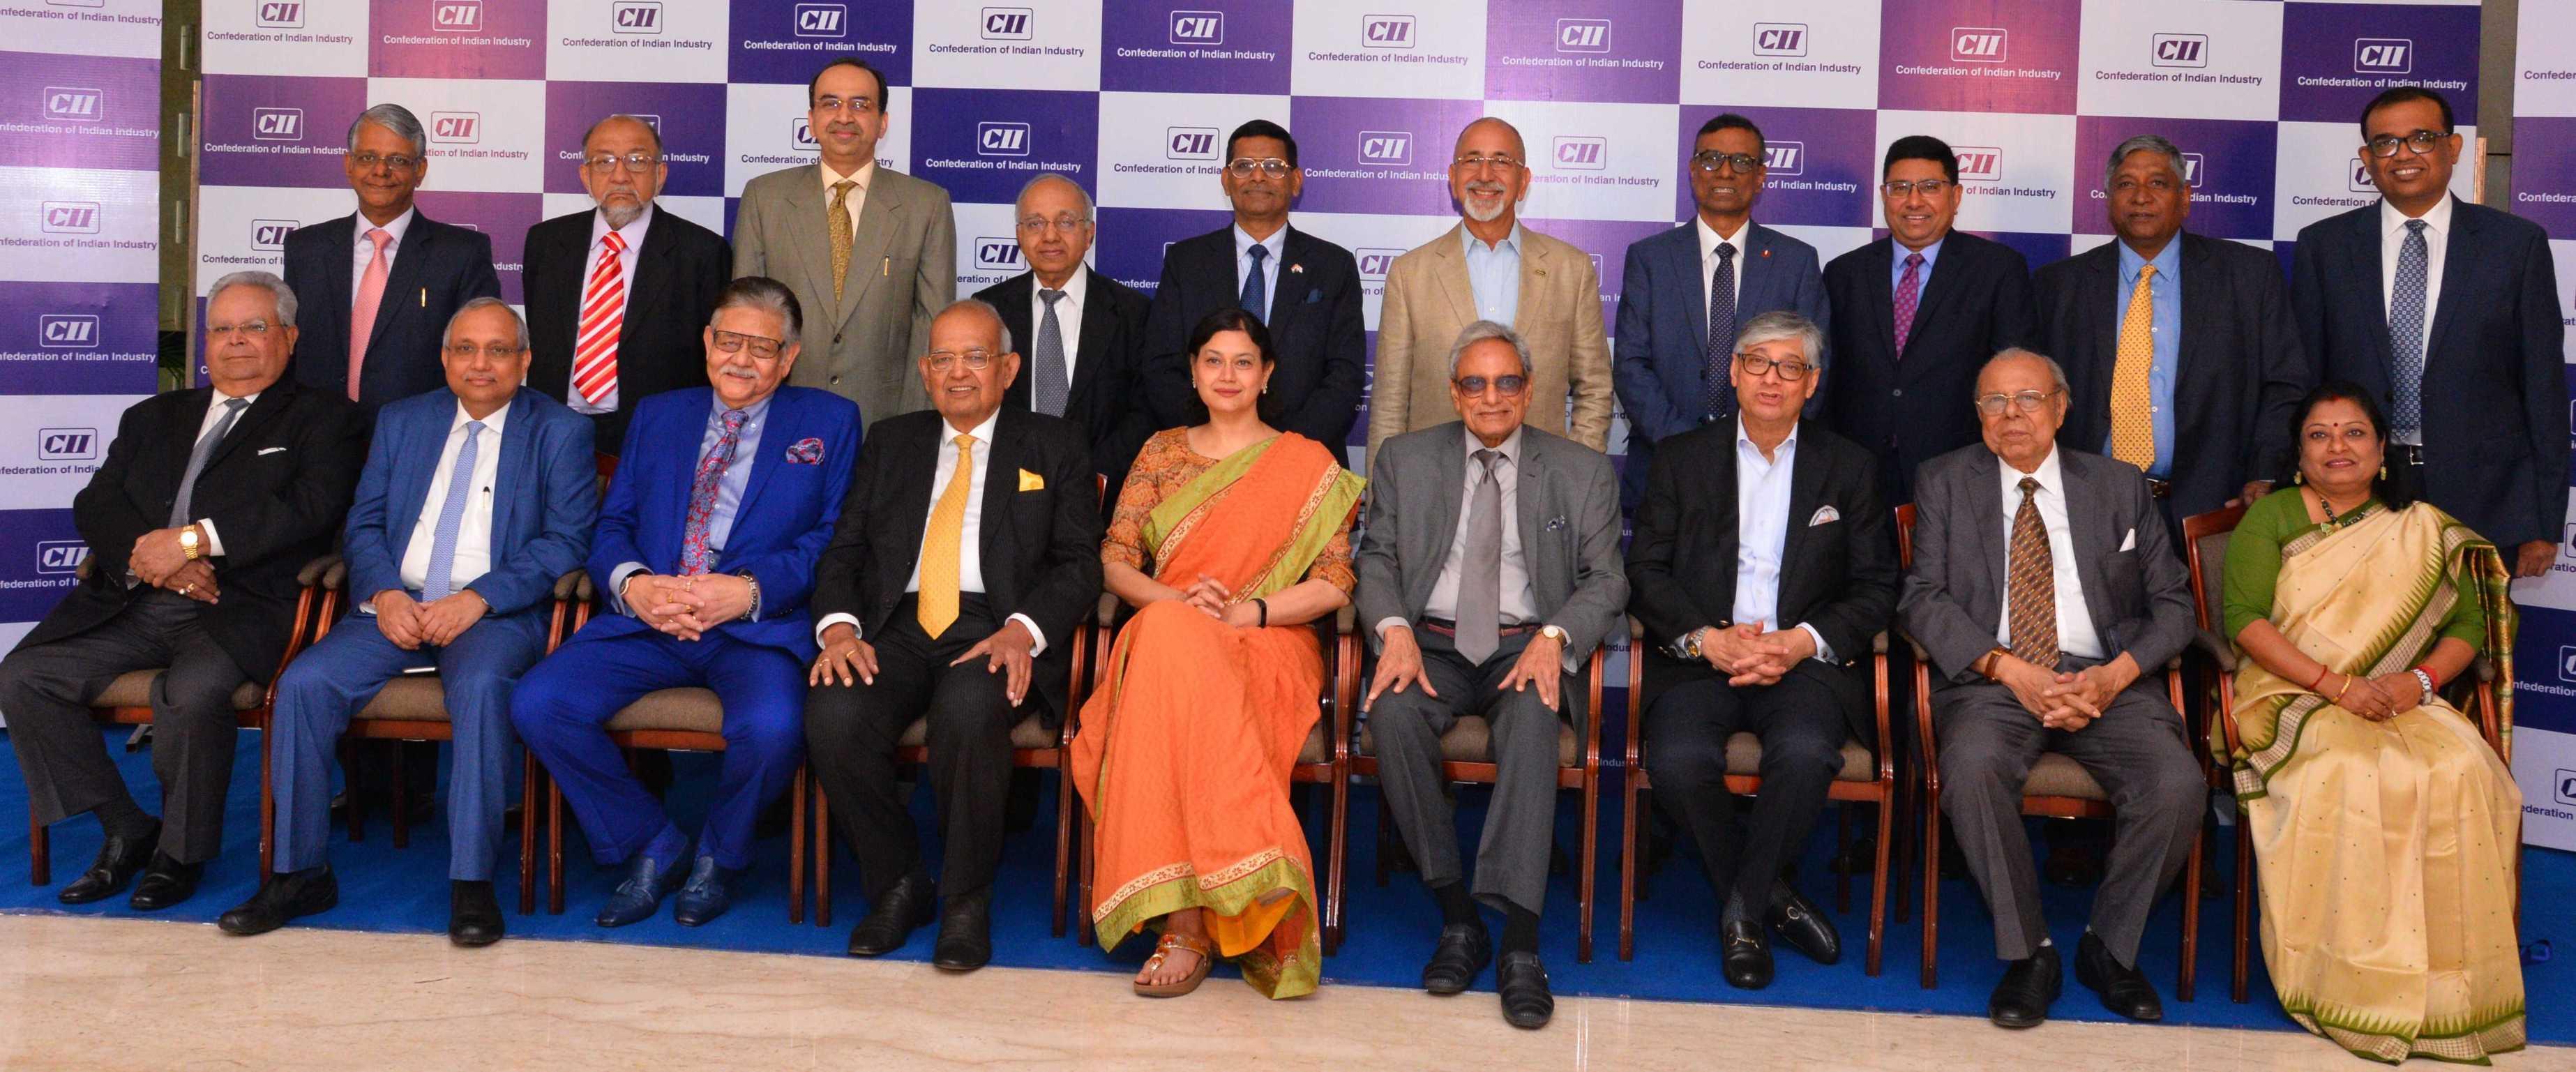 Industry stalwarts at the CII Annual General Meeting in Kolkata